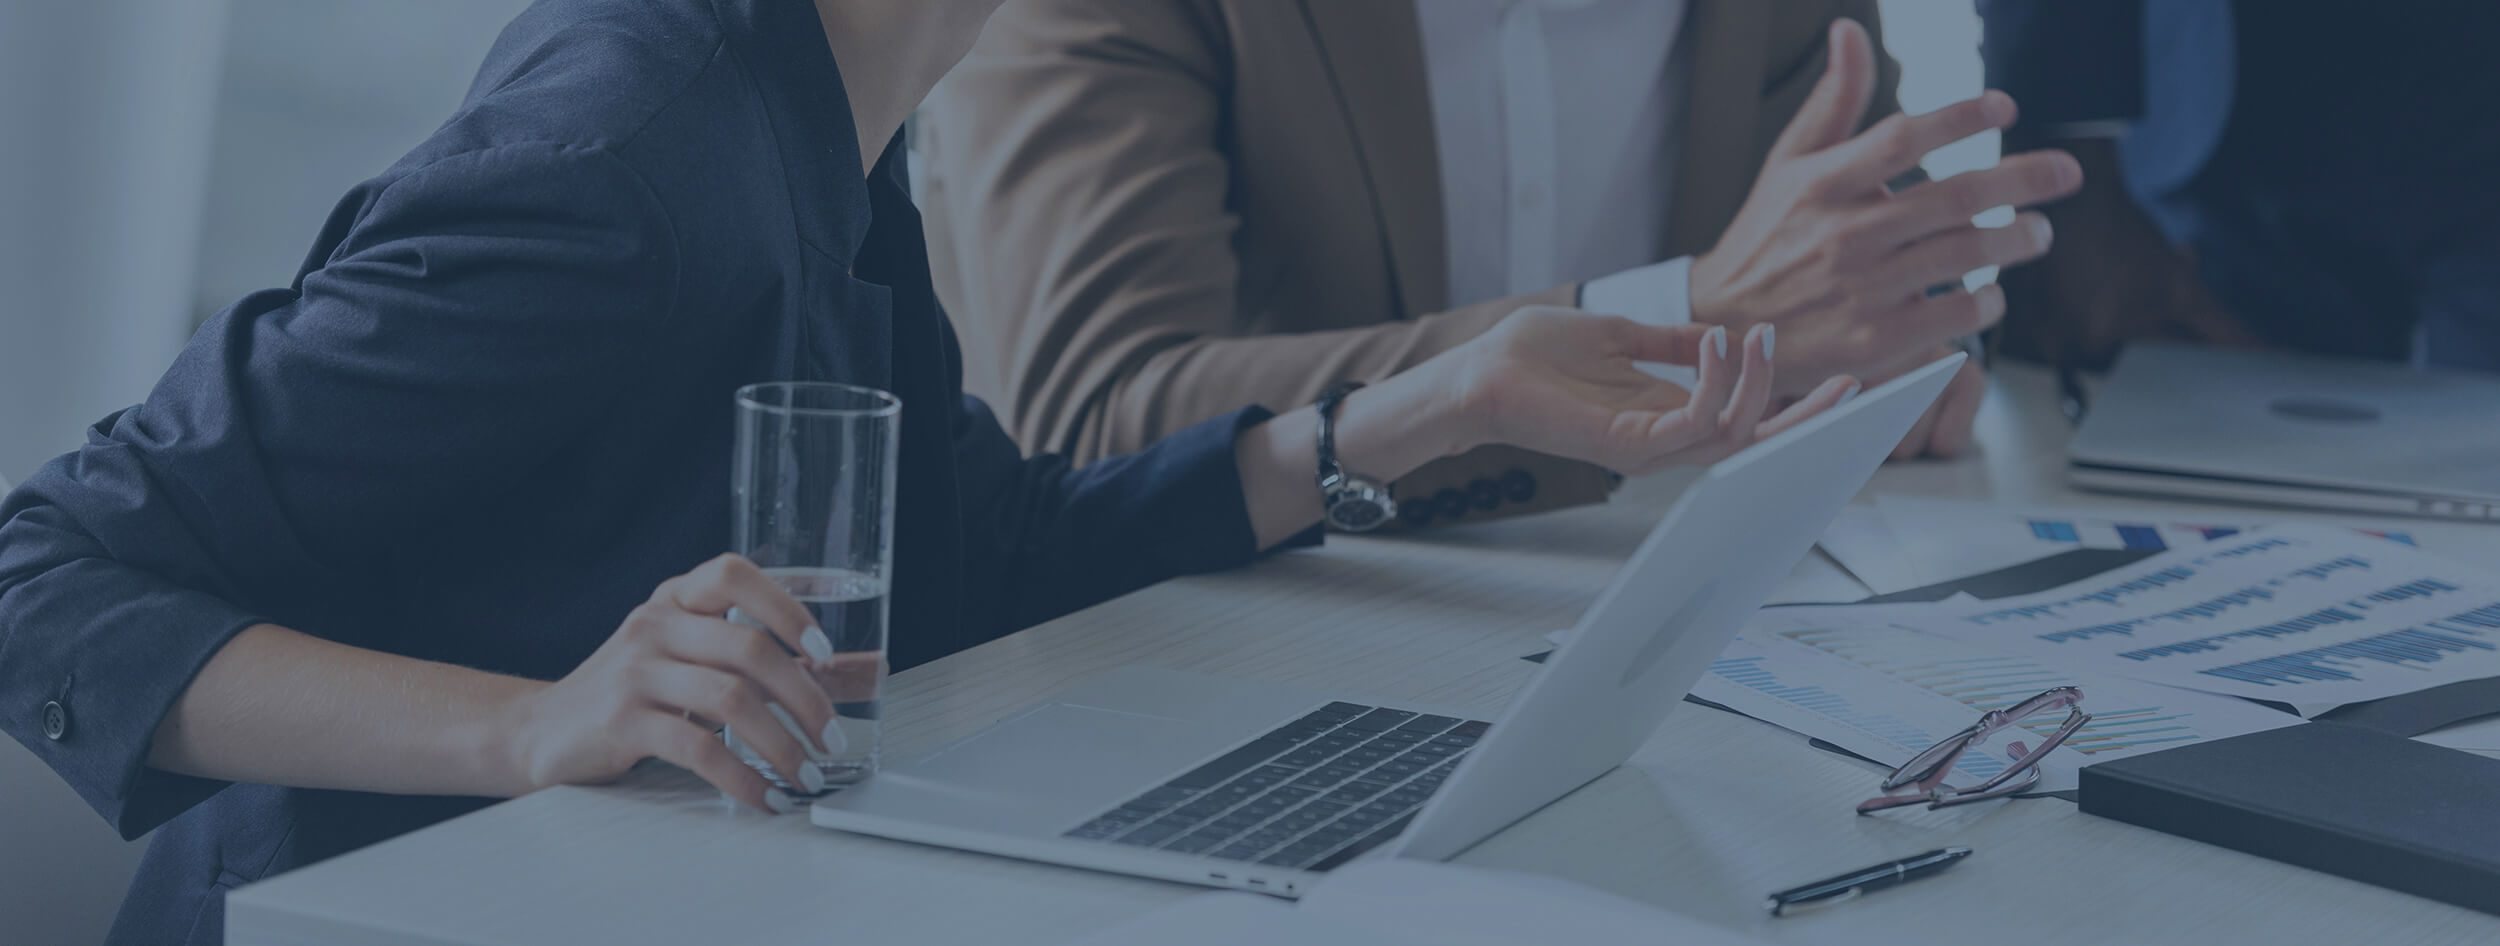 recruitment software services